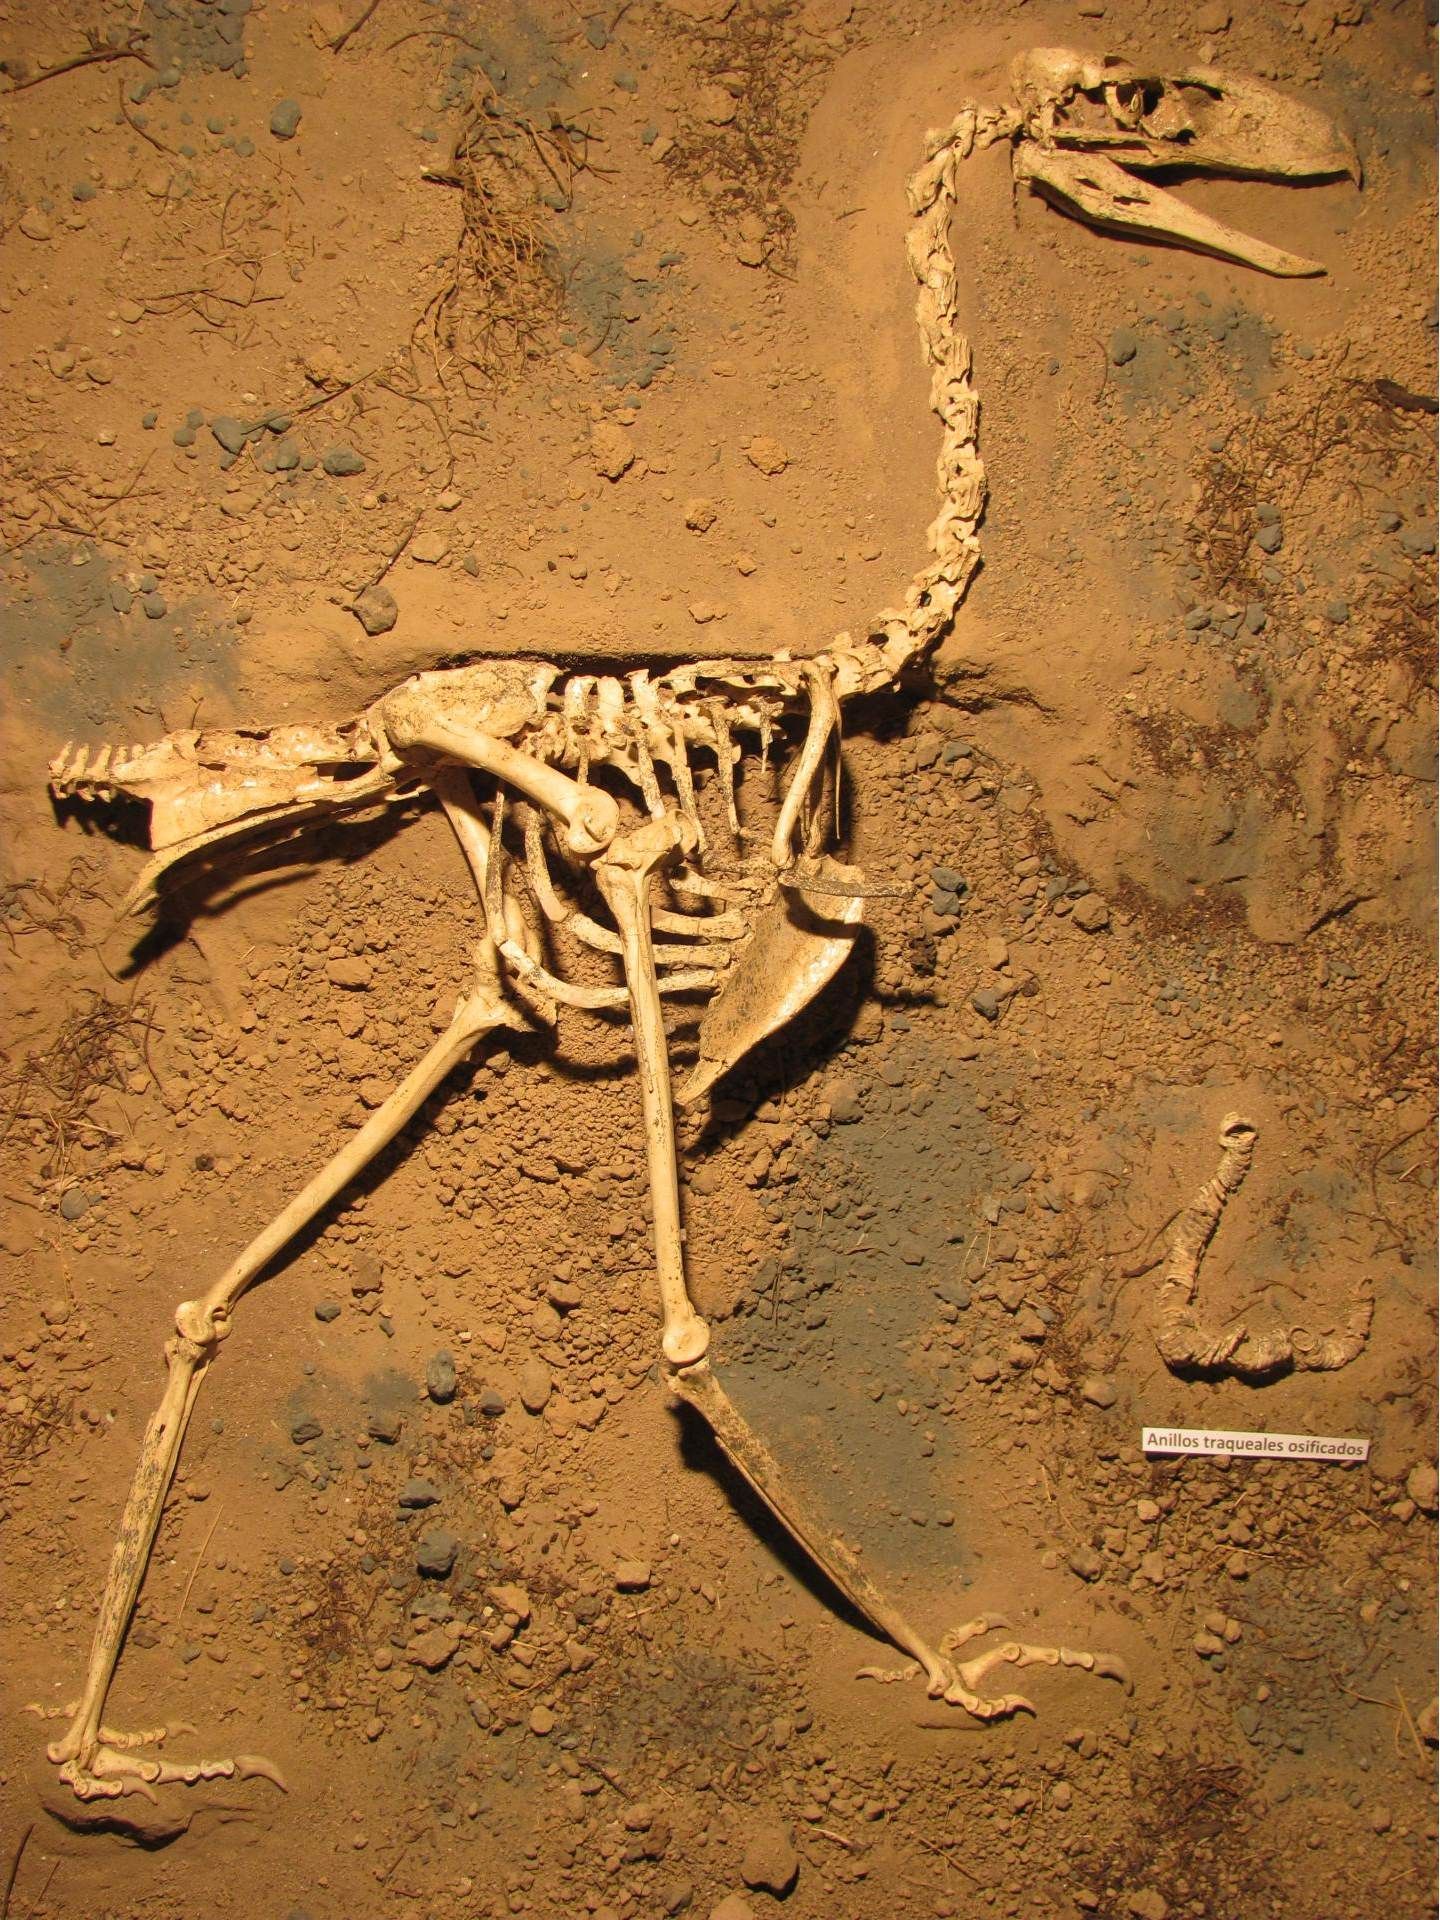 De resten van de schrikvogel Llallawavis scagliai. Afbeelding:  M. Taglioretti / F. Scaglia.